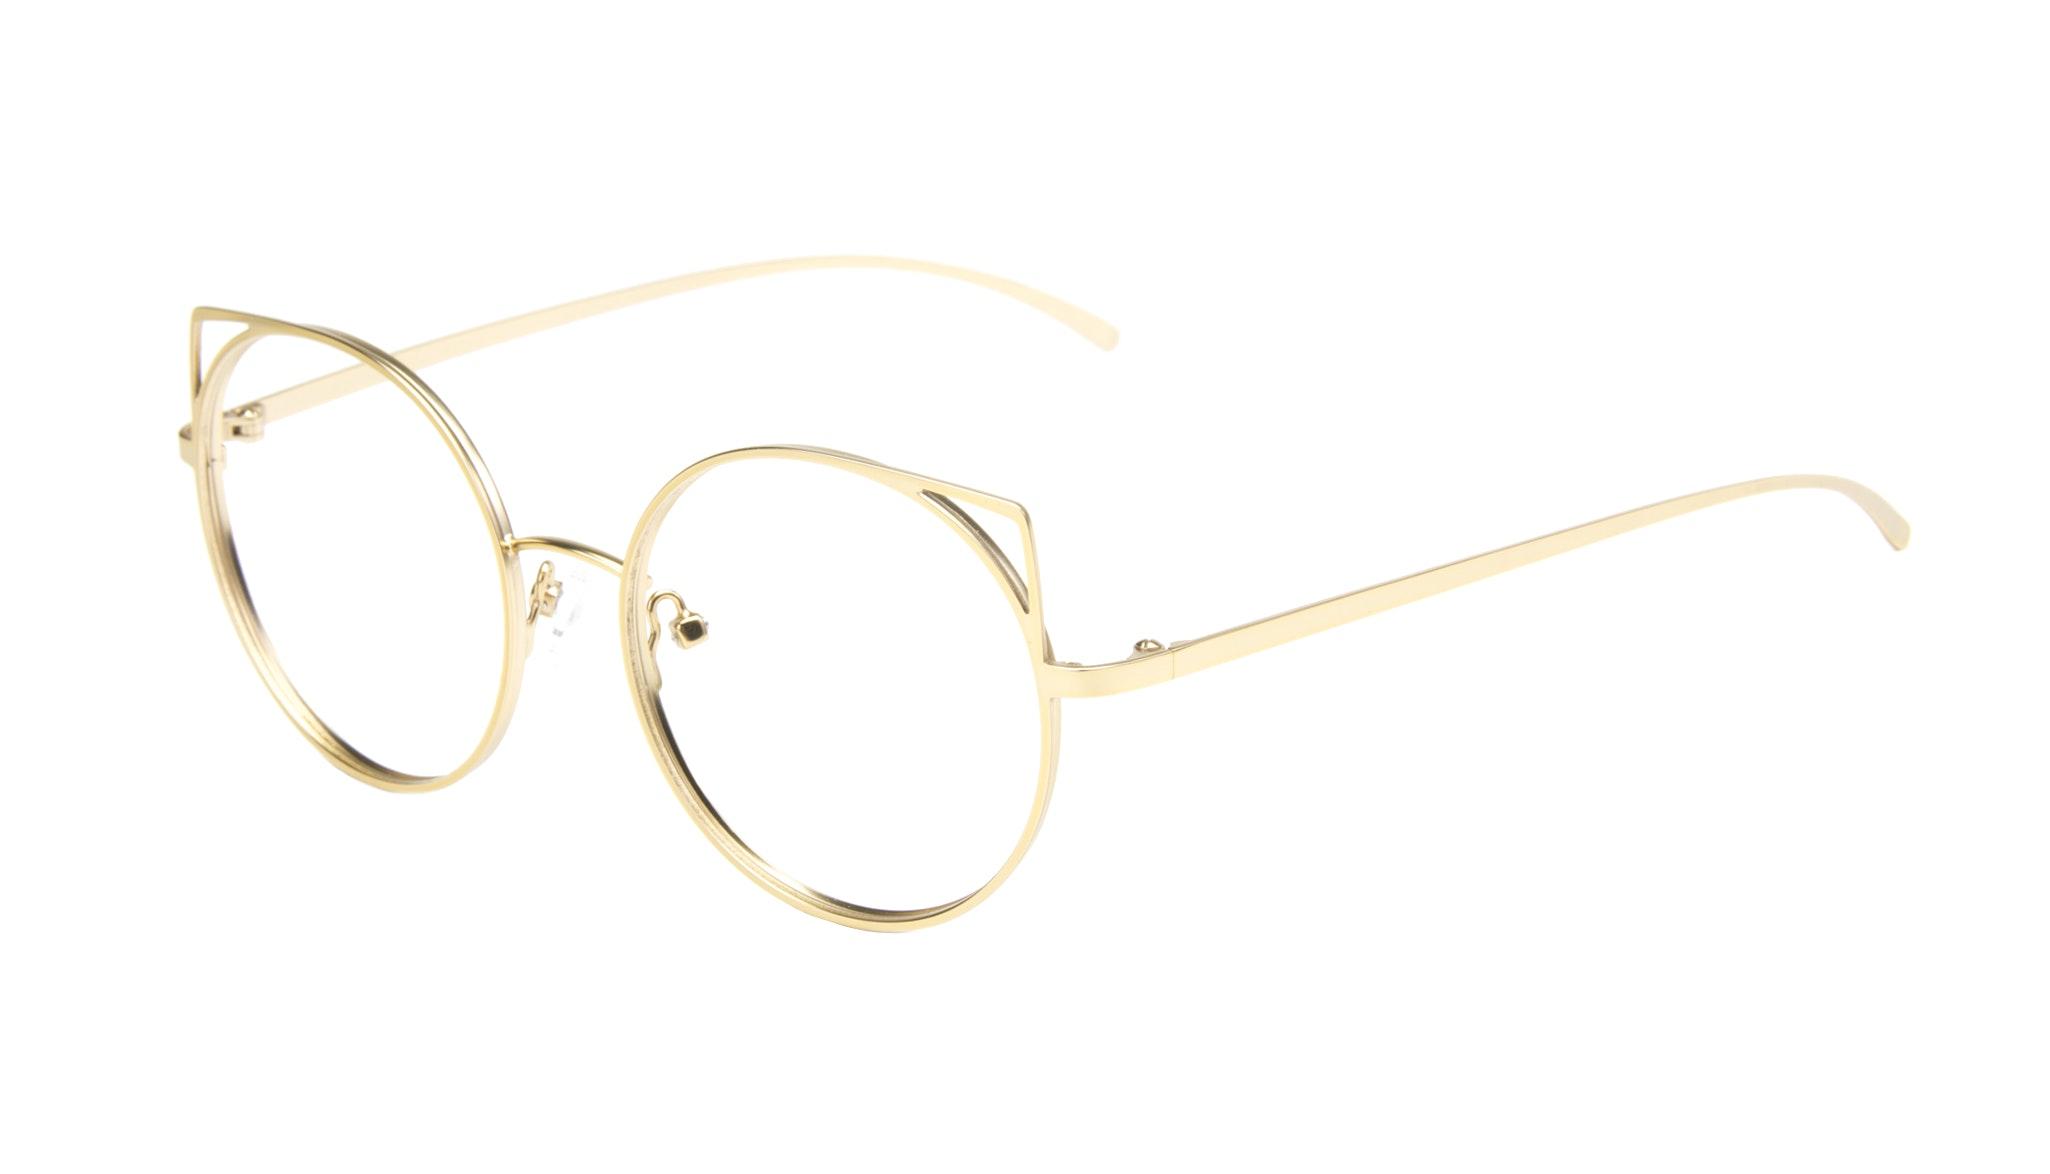 Affordable Fashion Glasses Cat Eye Round Eyeglasses Women Lolly Lady Midnight Tilt